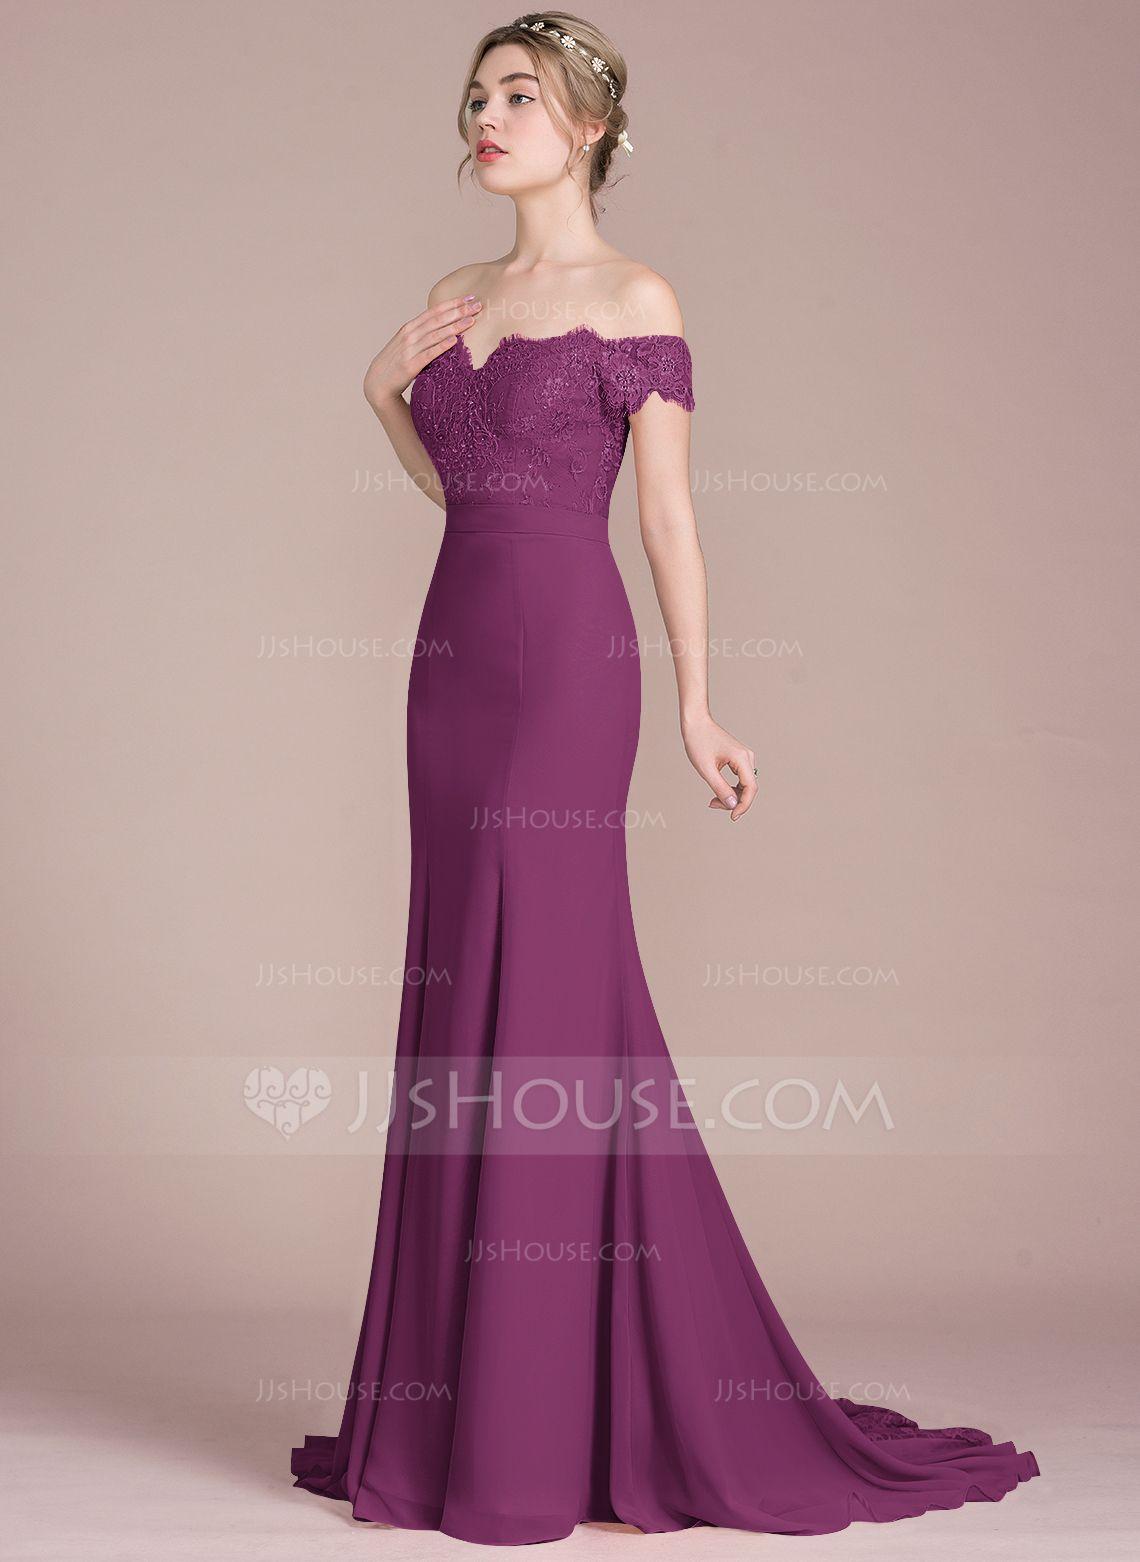 Perfecto Vestidos De Boda Baratos Jjshouse Ornamento - Vestido de ...